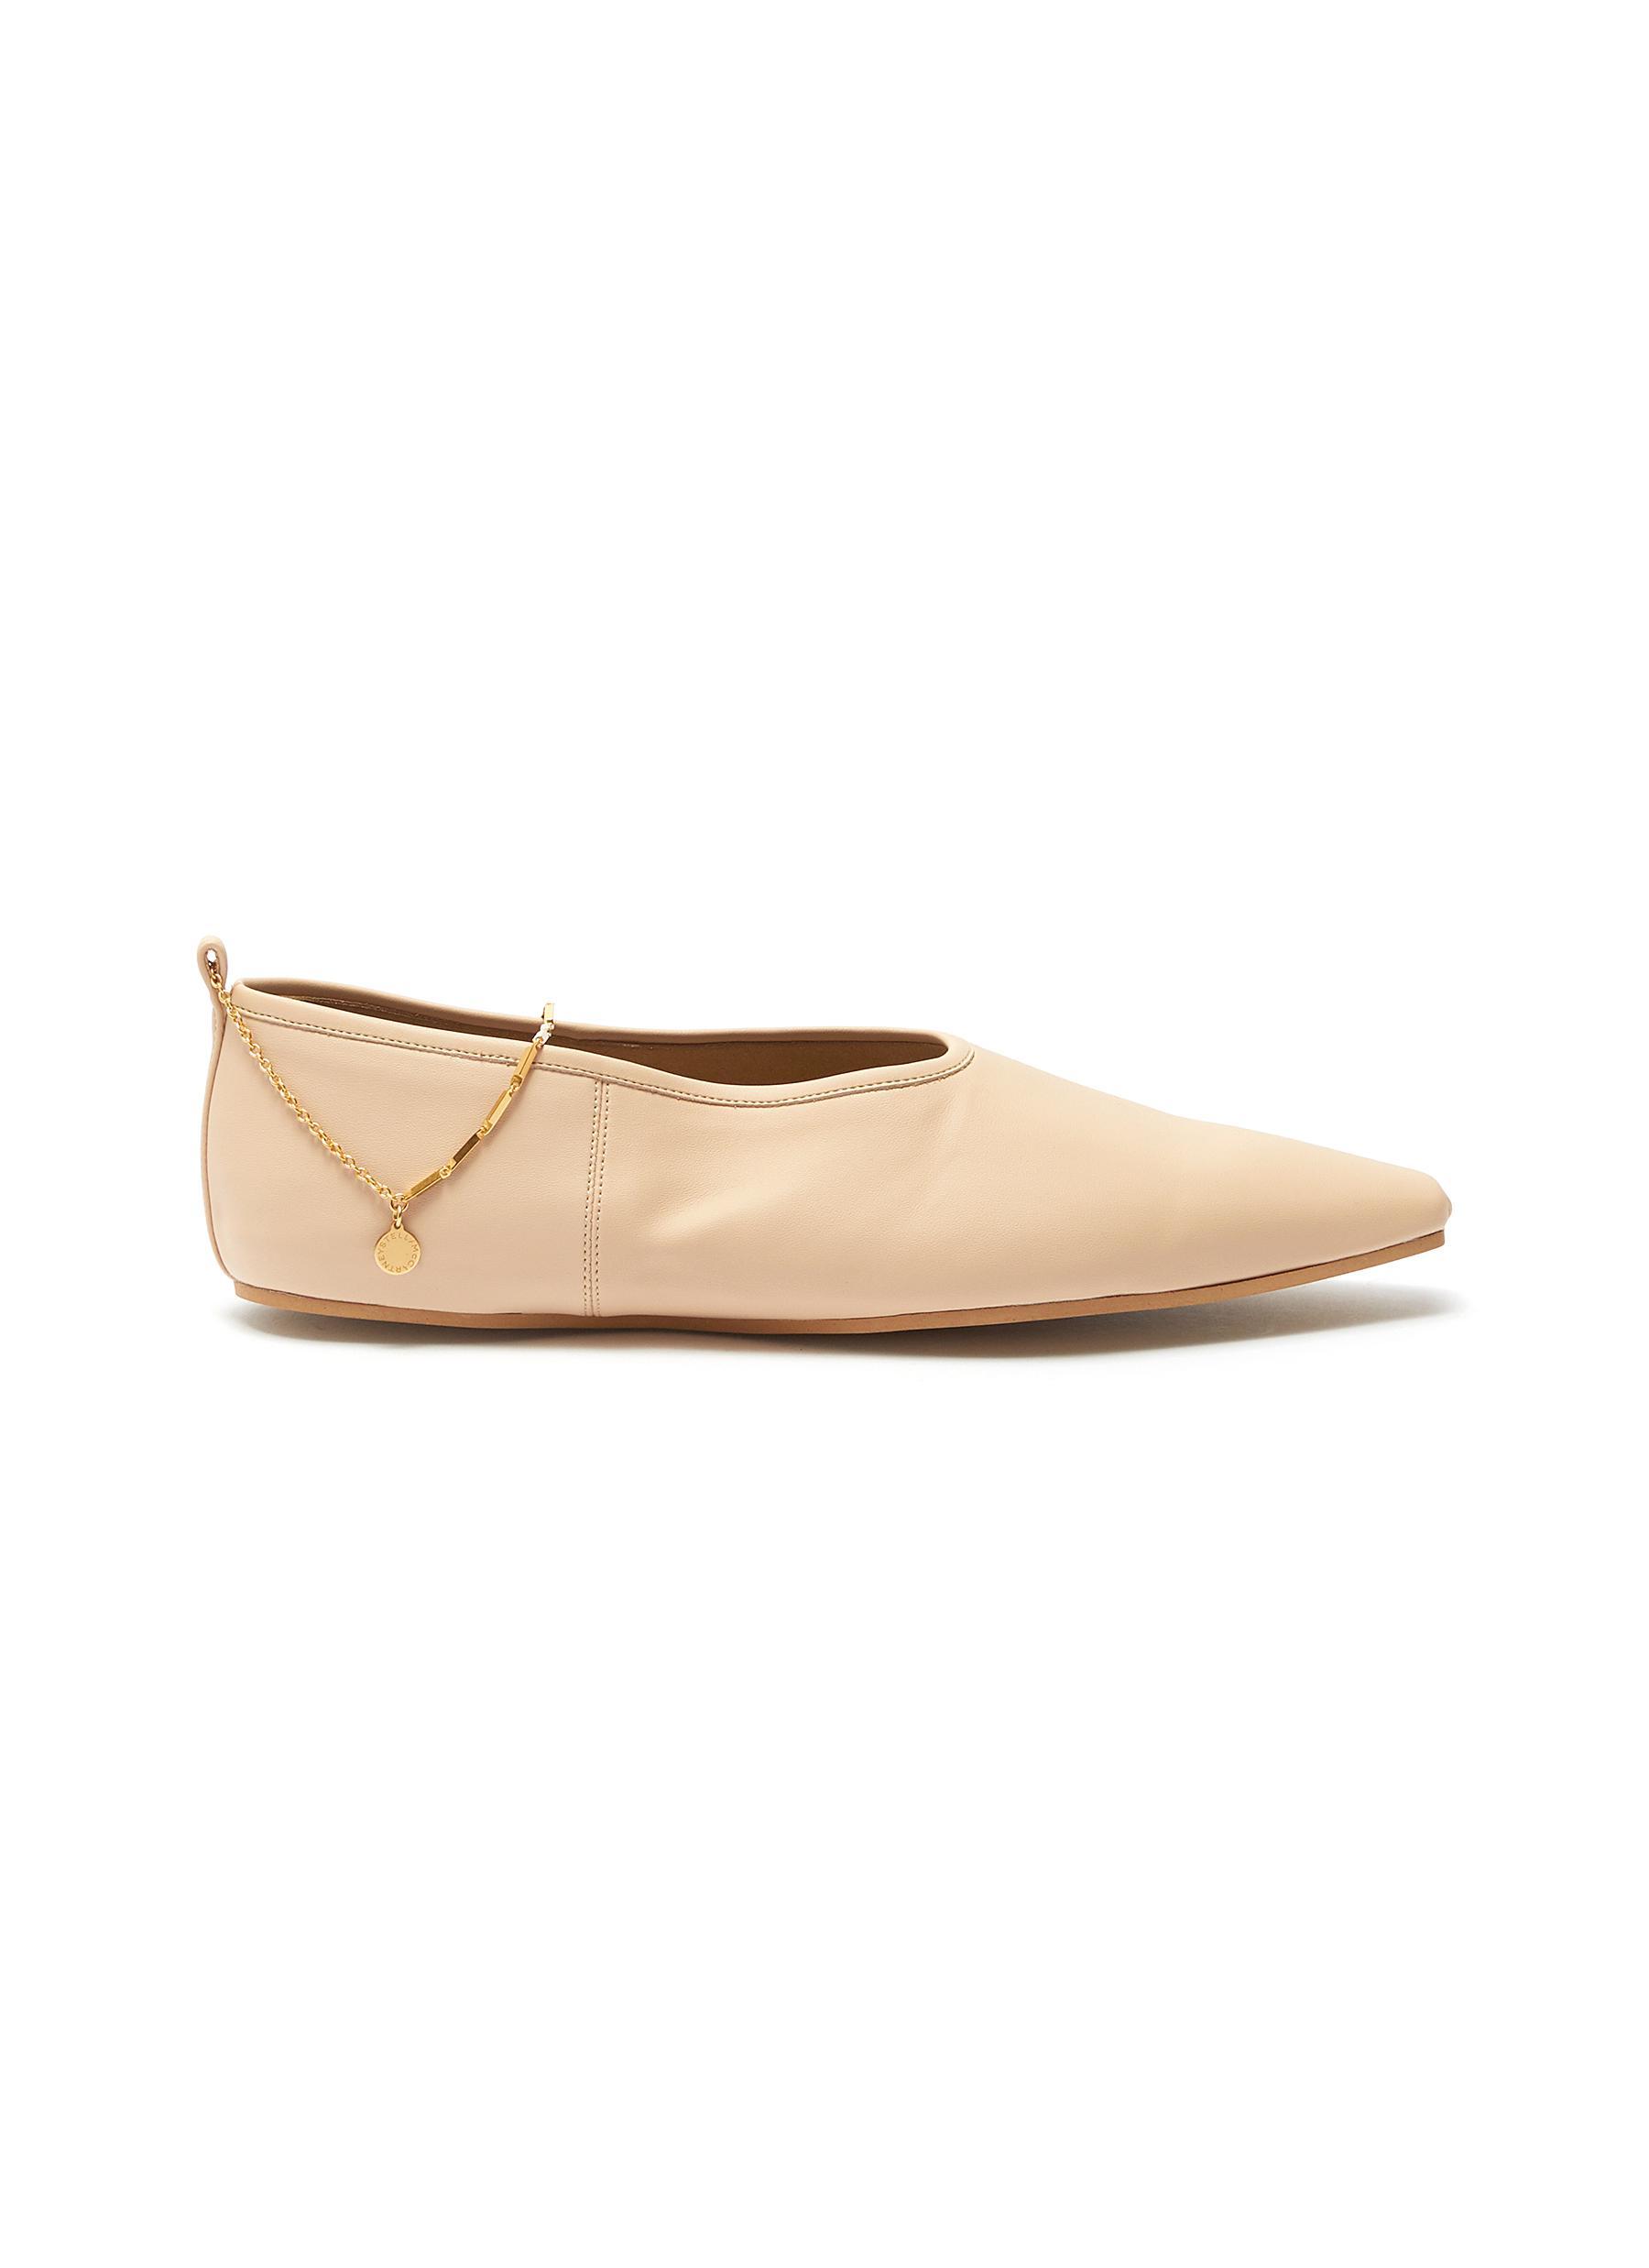 Stella Mccartney Flats Anklet ballerina flats